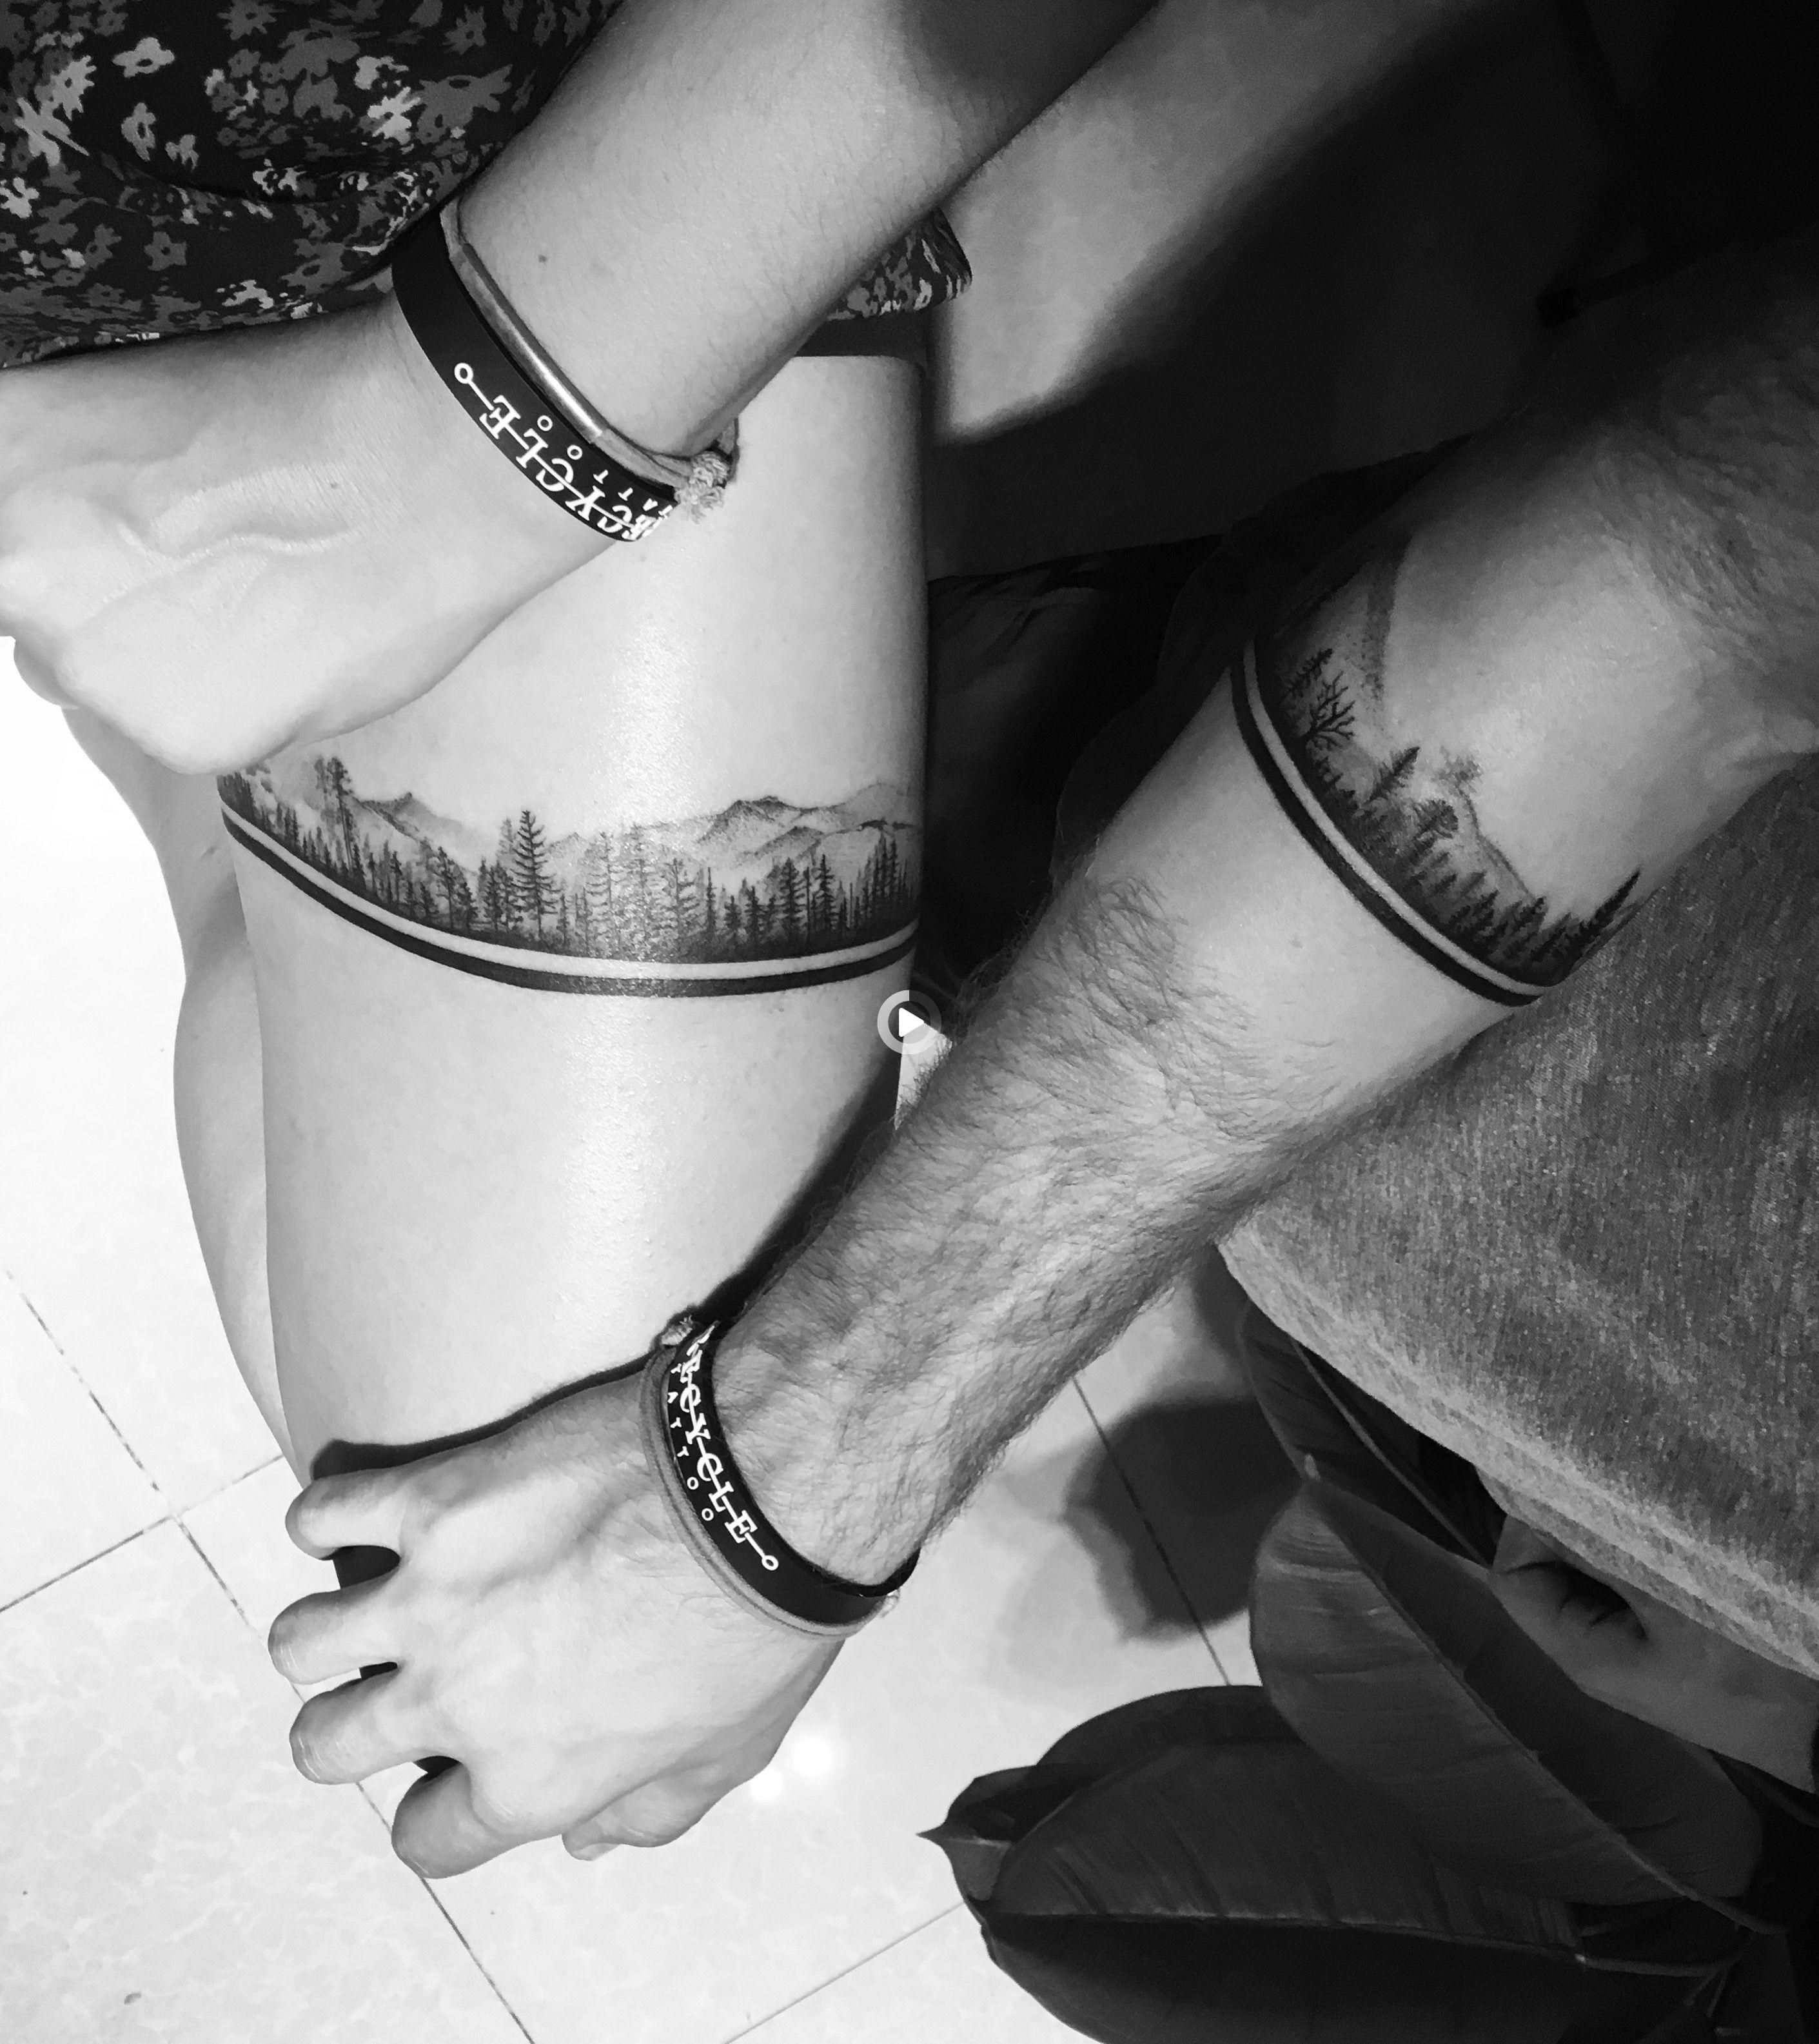 Mann band unterarm tattoo 53 Schrift